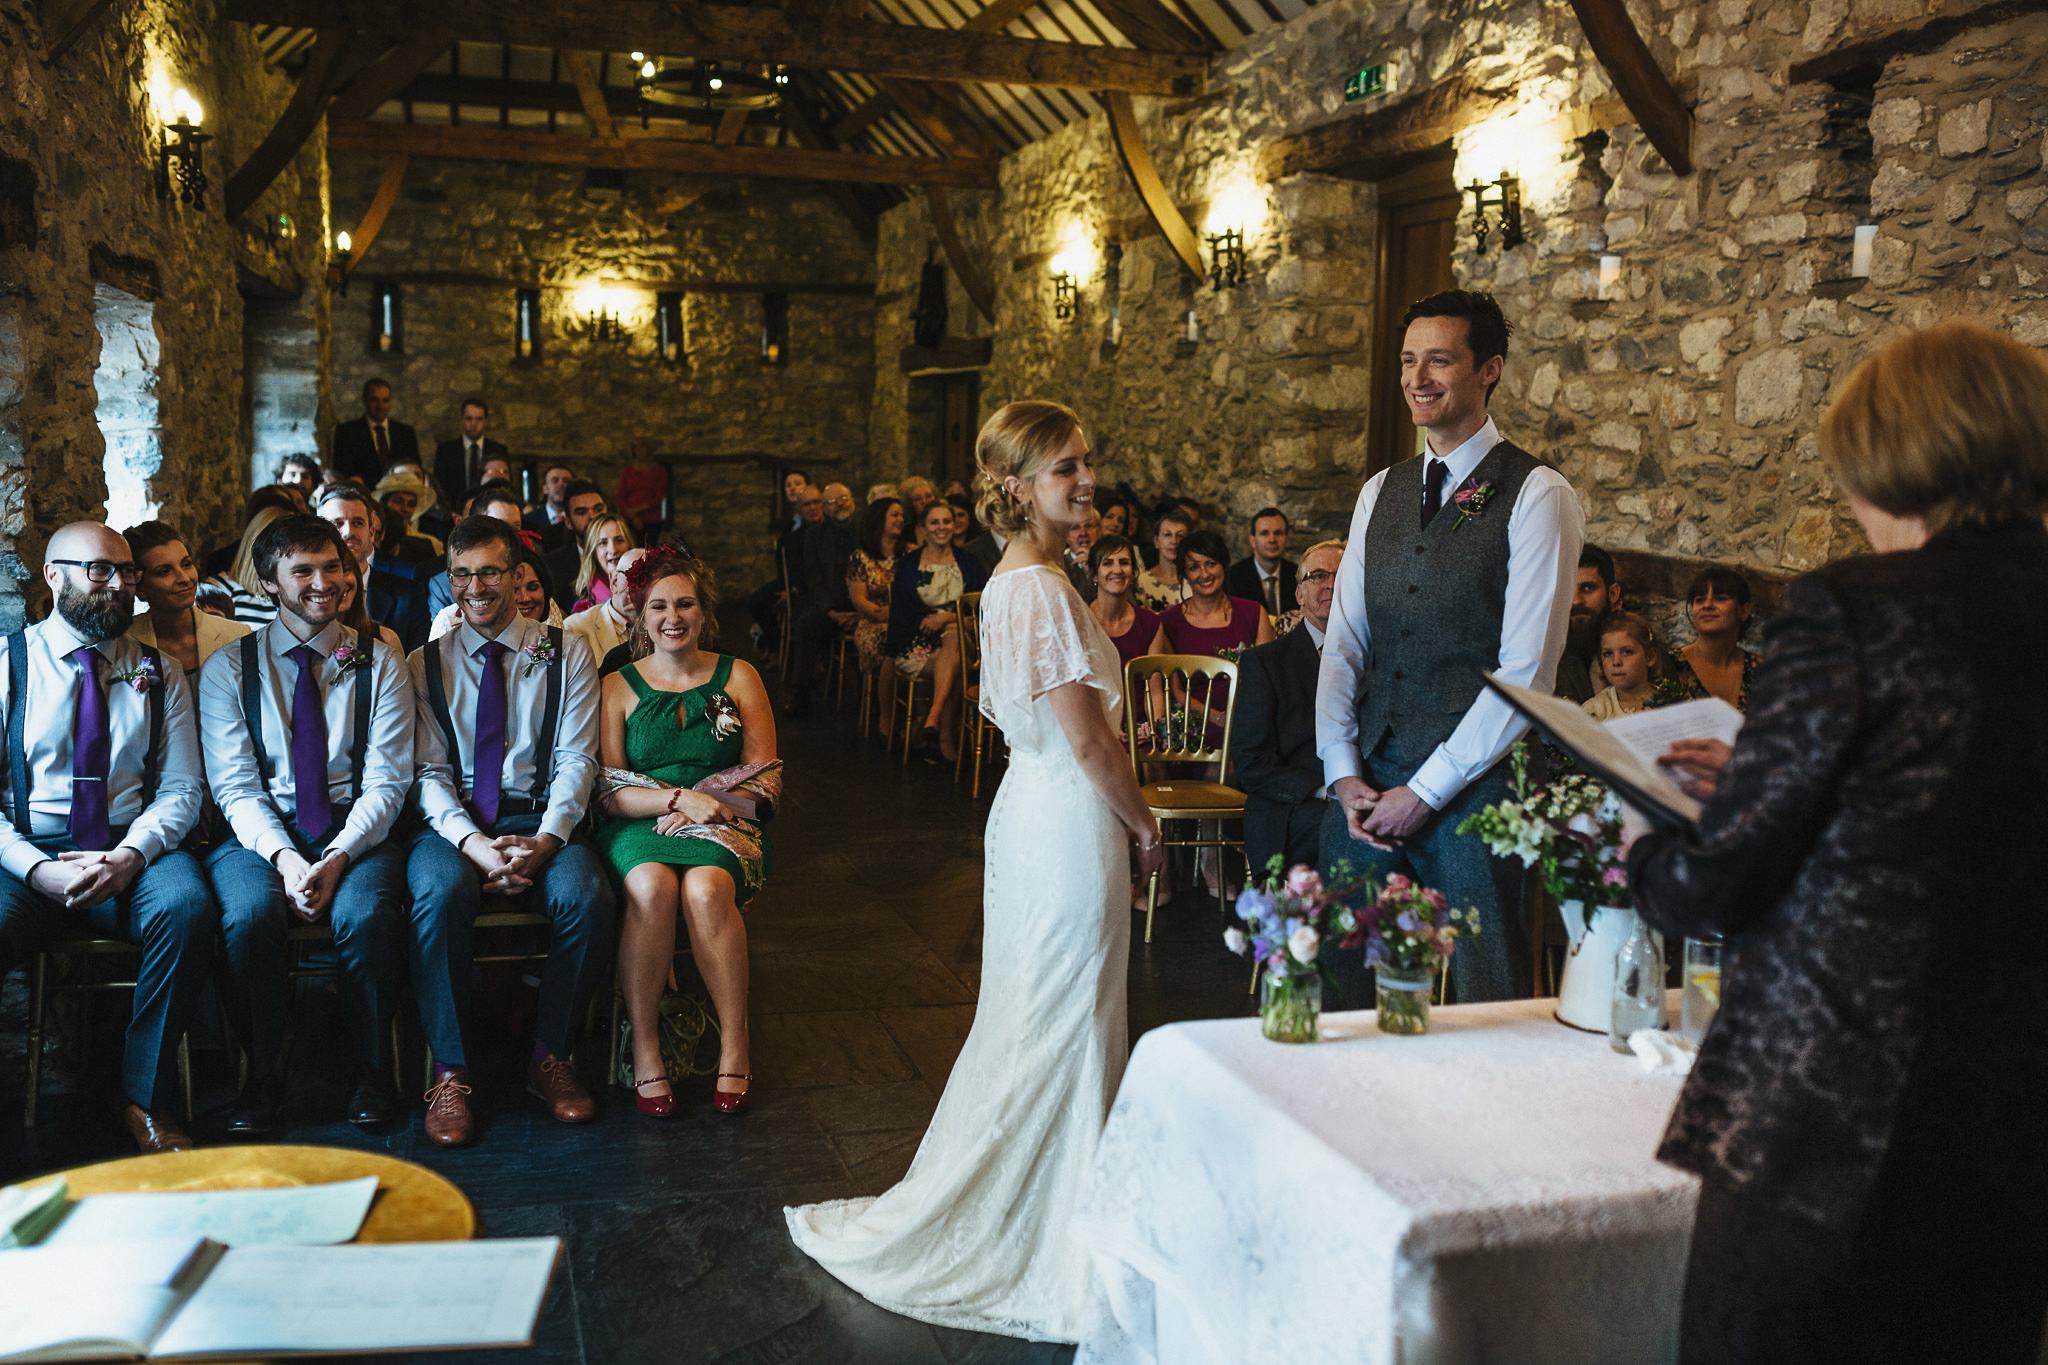 plas-isaf-corwen-north wales wedding-photography-photographer-91027